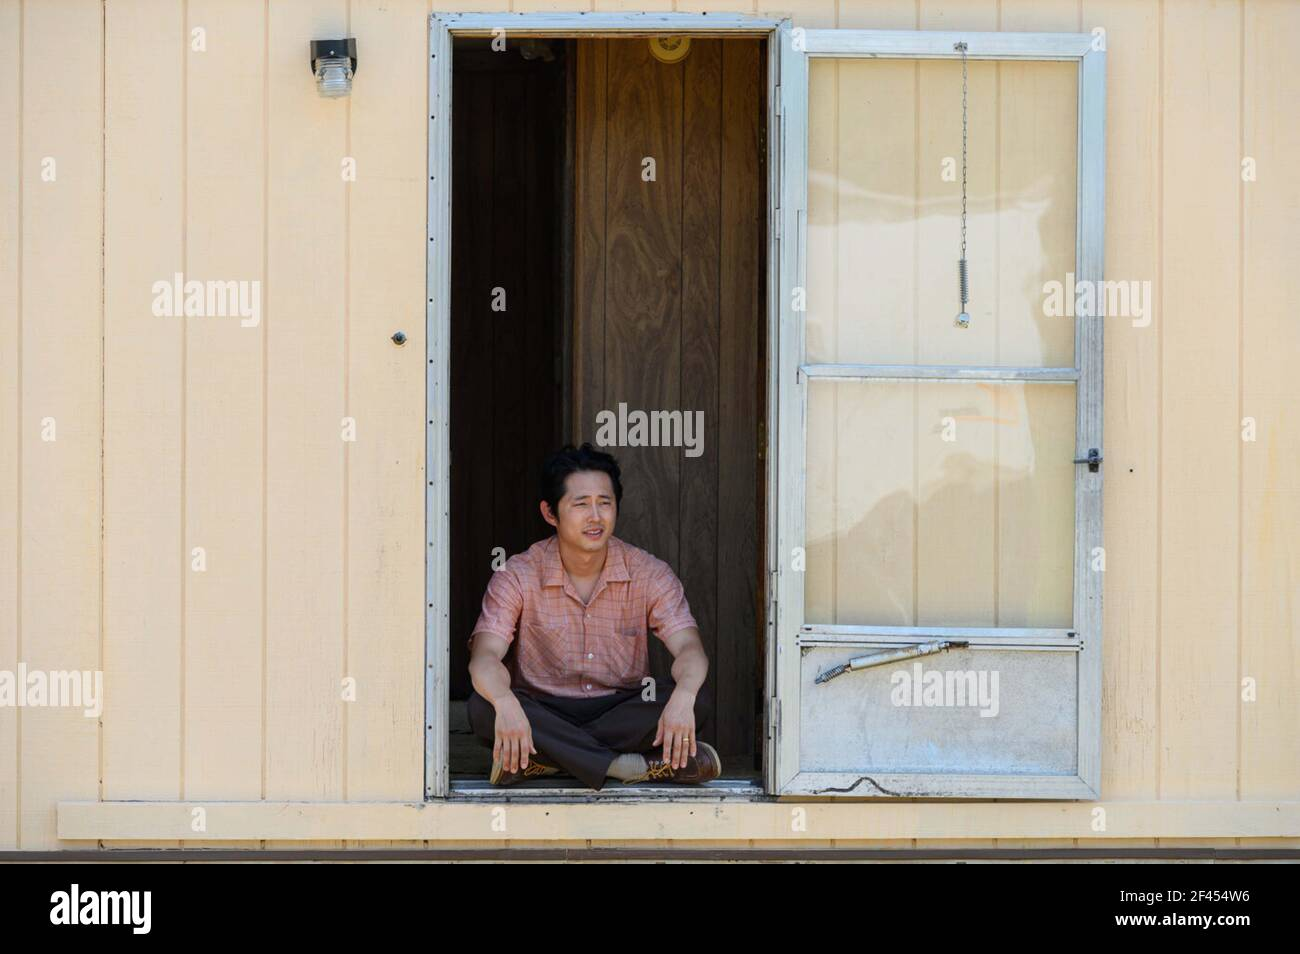 MINARI (2020) STEVEN YEUN LEE ISAAC CHUNG (DIR) A24/MOVIESTORE KOLLEKTION LTD Stockfoto